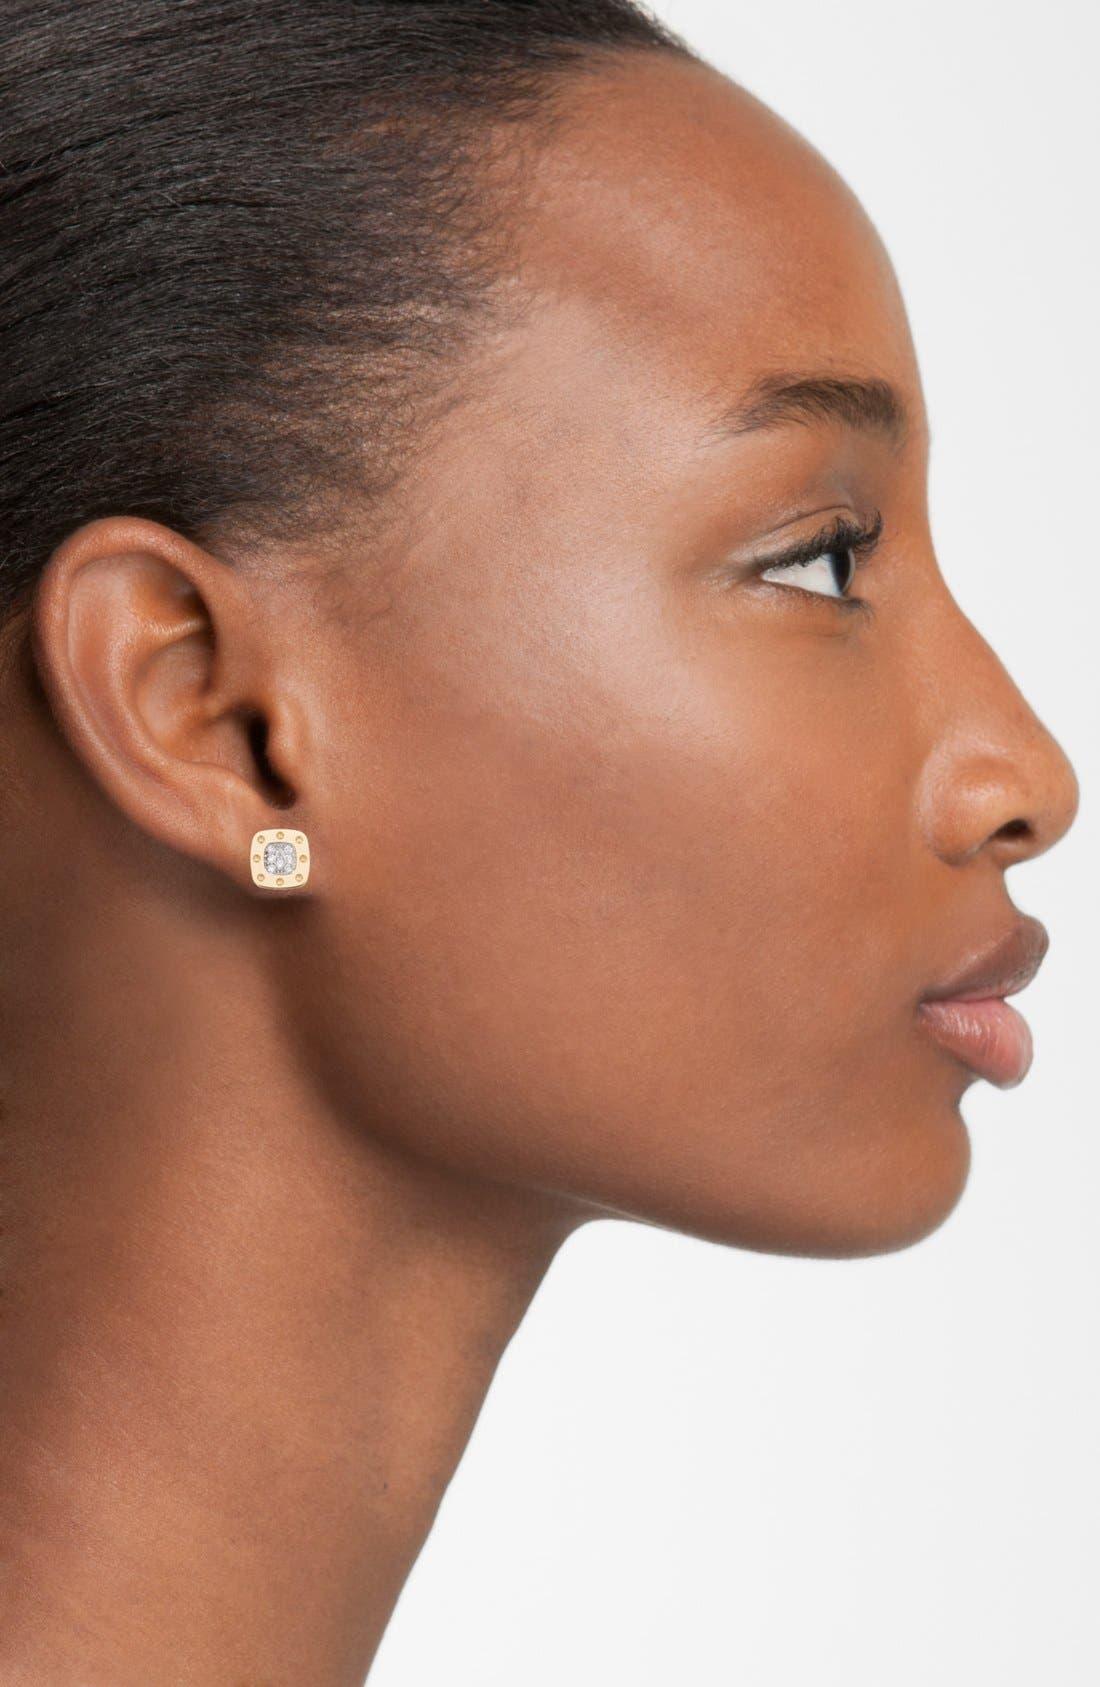 'Pois Moi' Diamond Stud Earrings,                             Alternate thumbnail 3, color,                             YELLOW GOLD